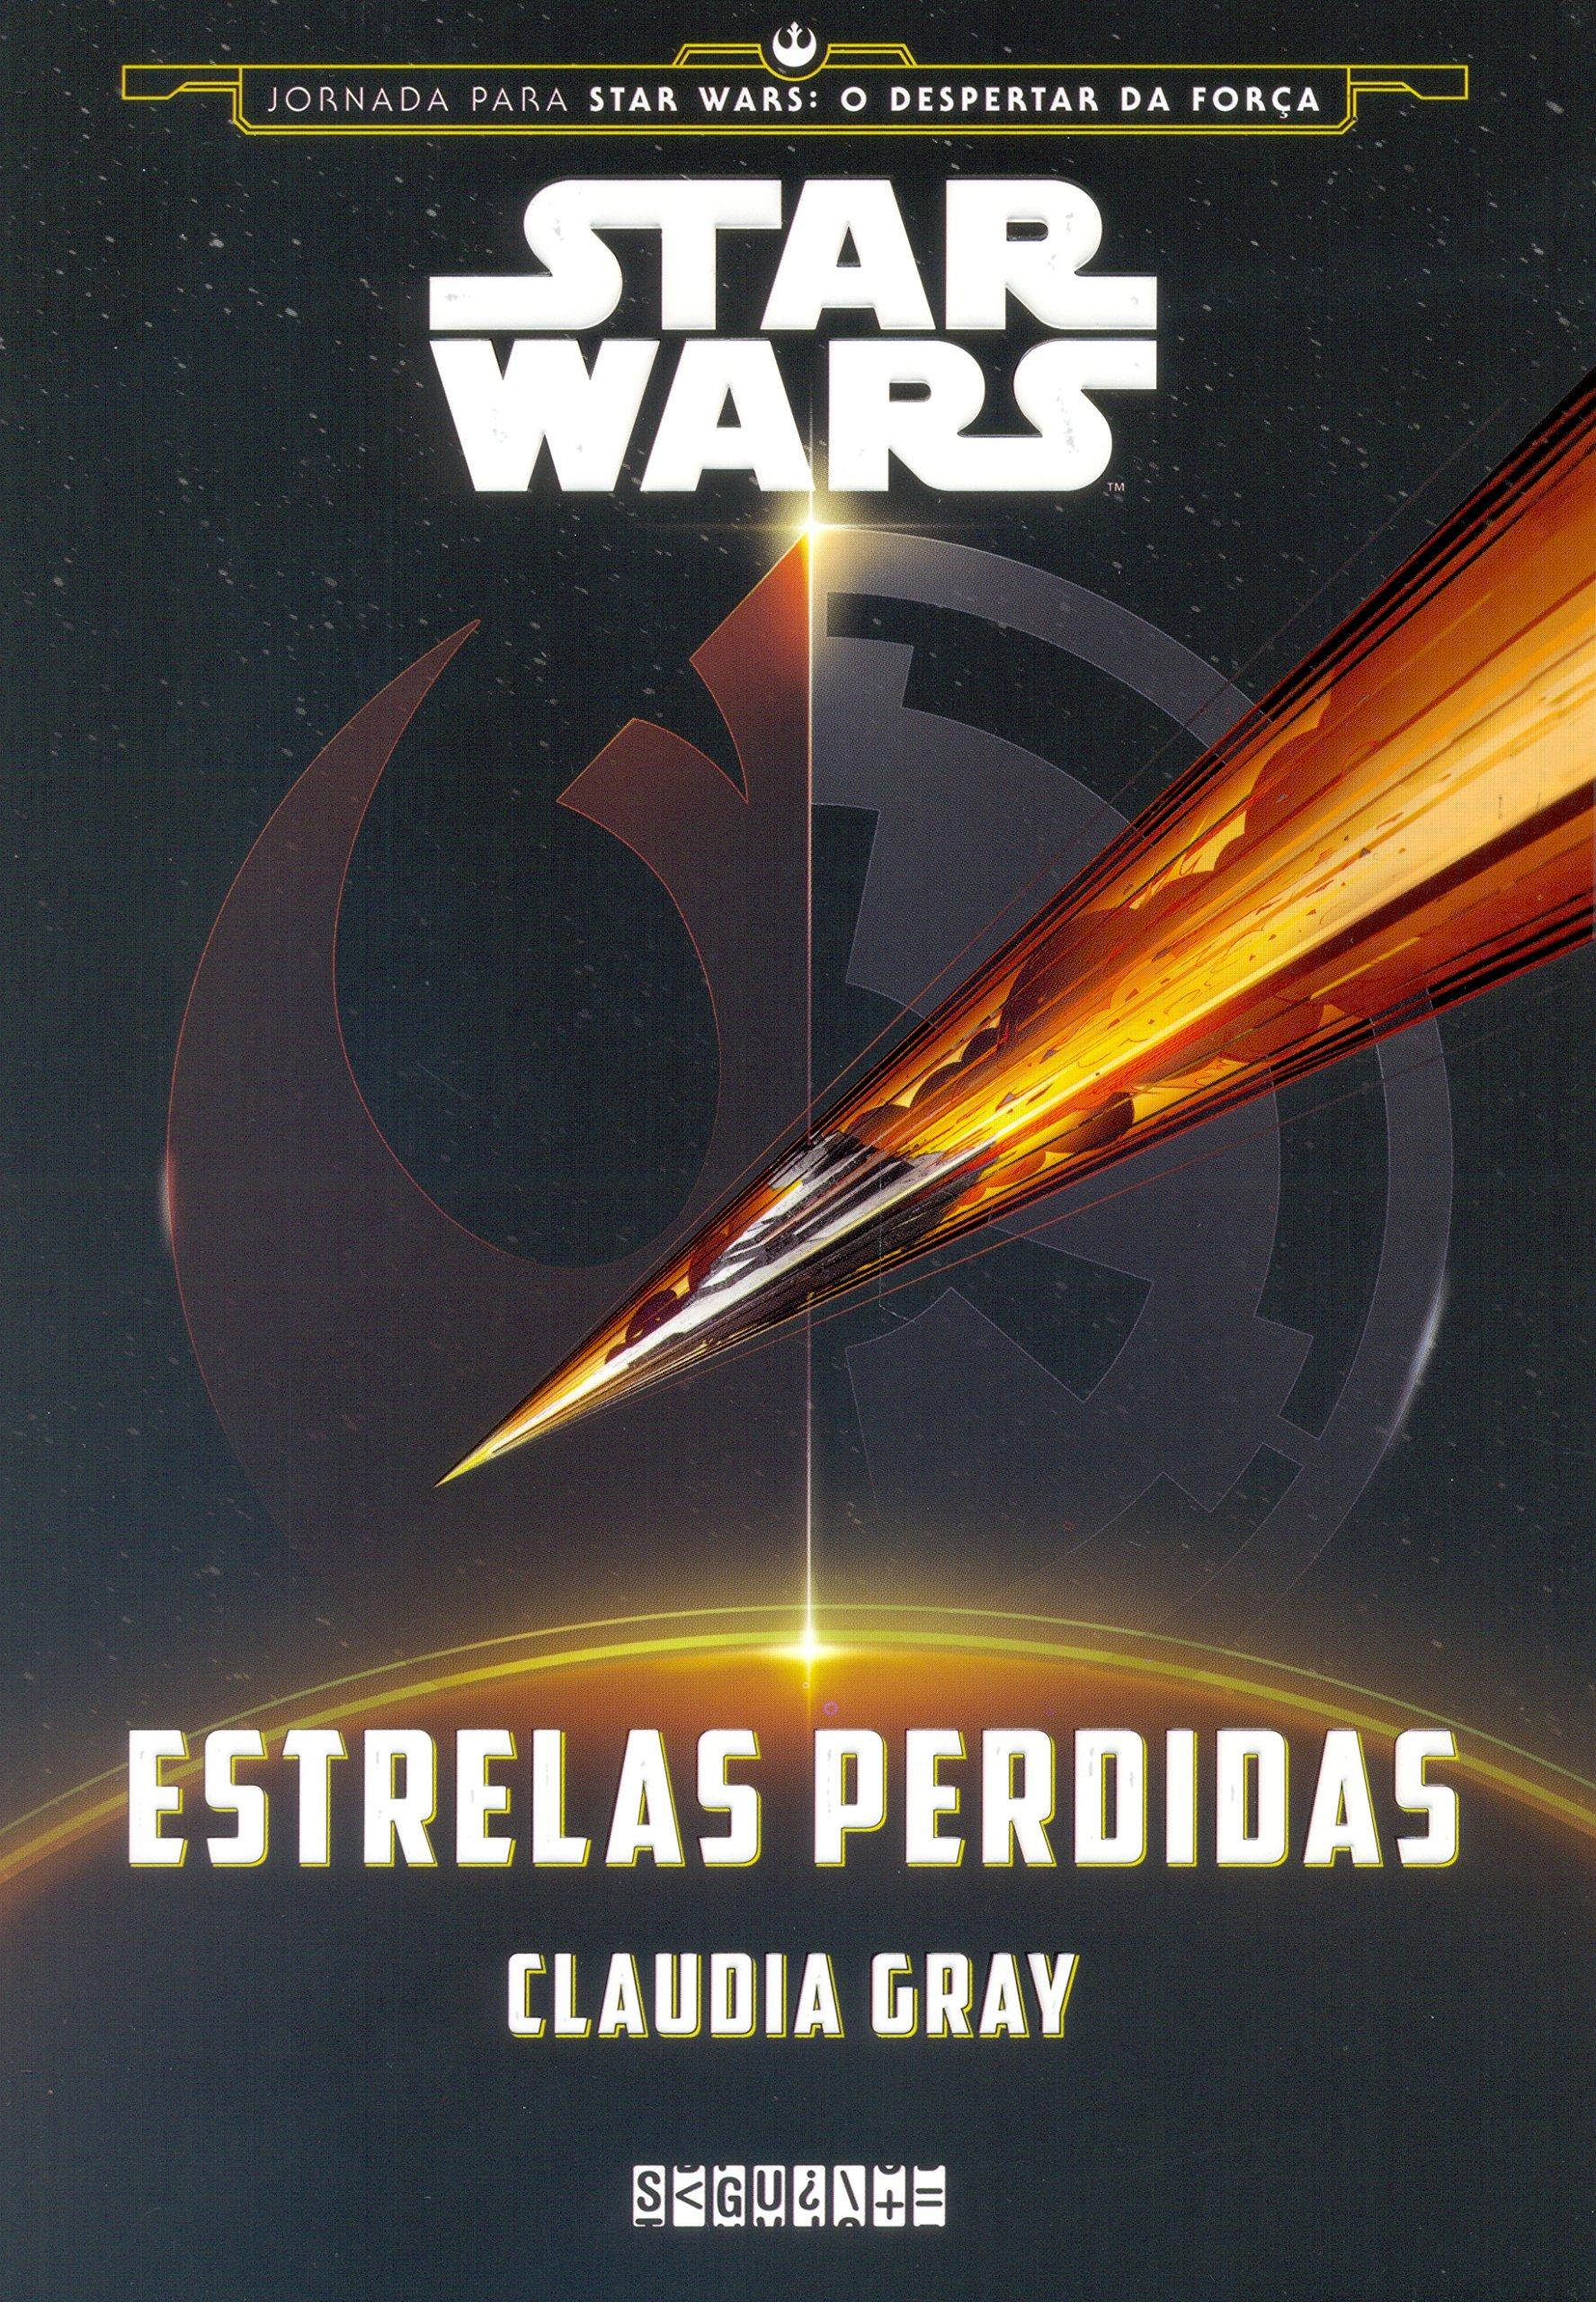 Resenha - Star Wars: Estrelas Perdidas Claudia Gray